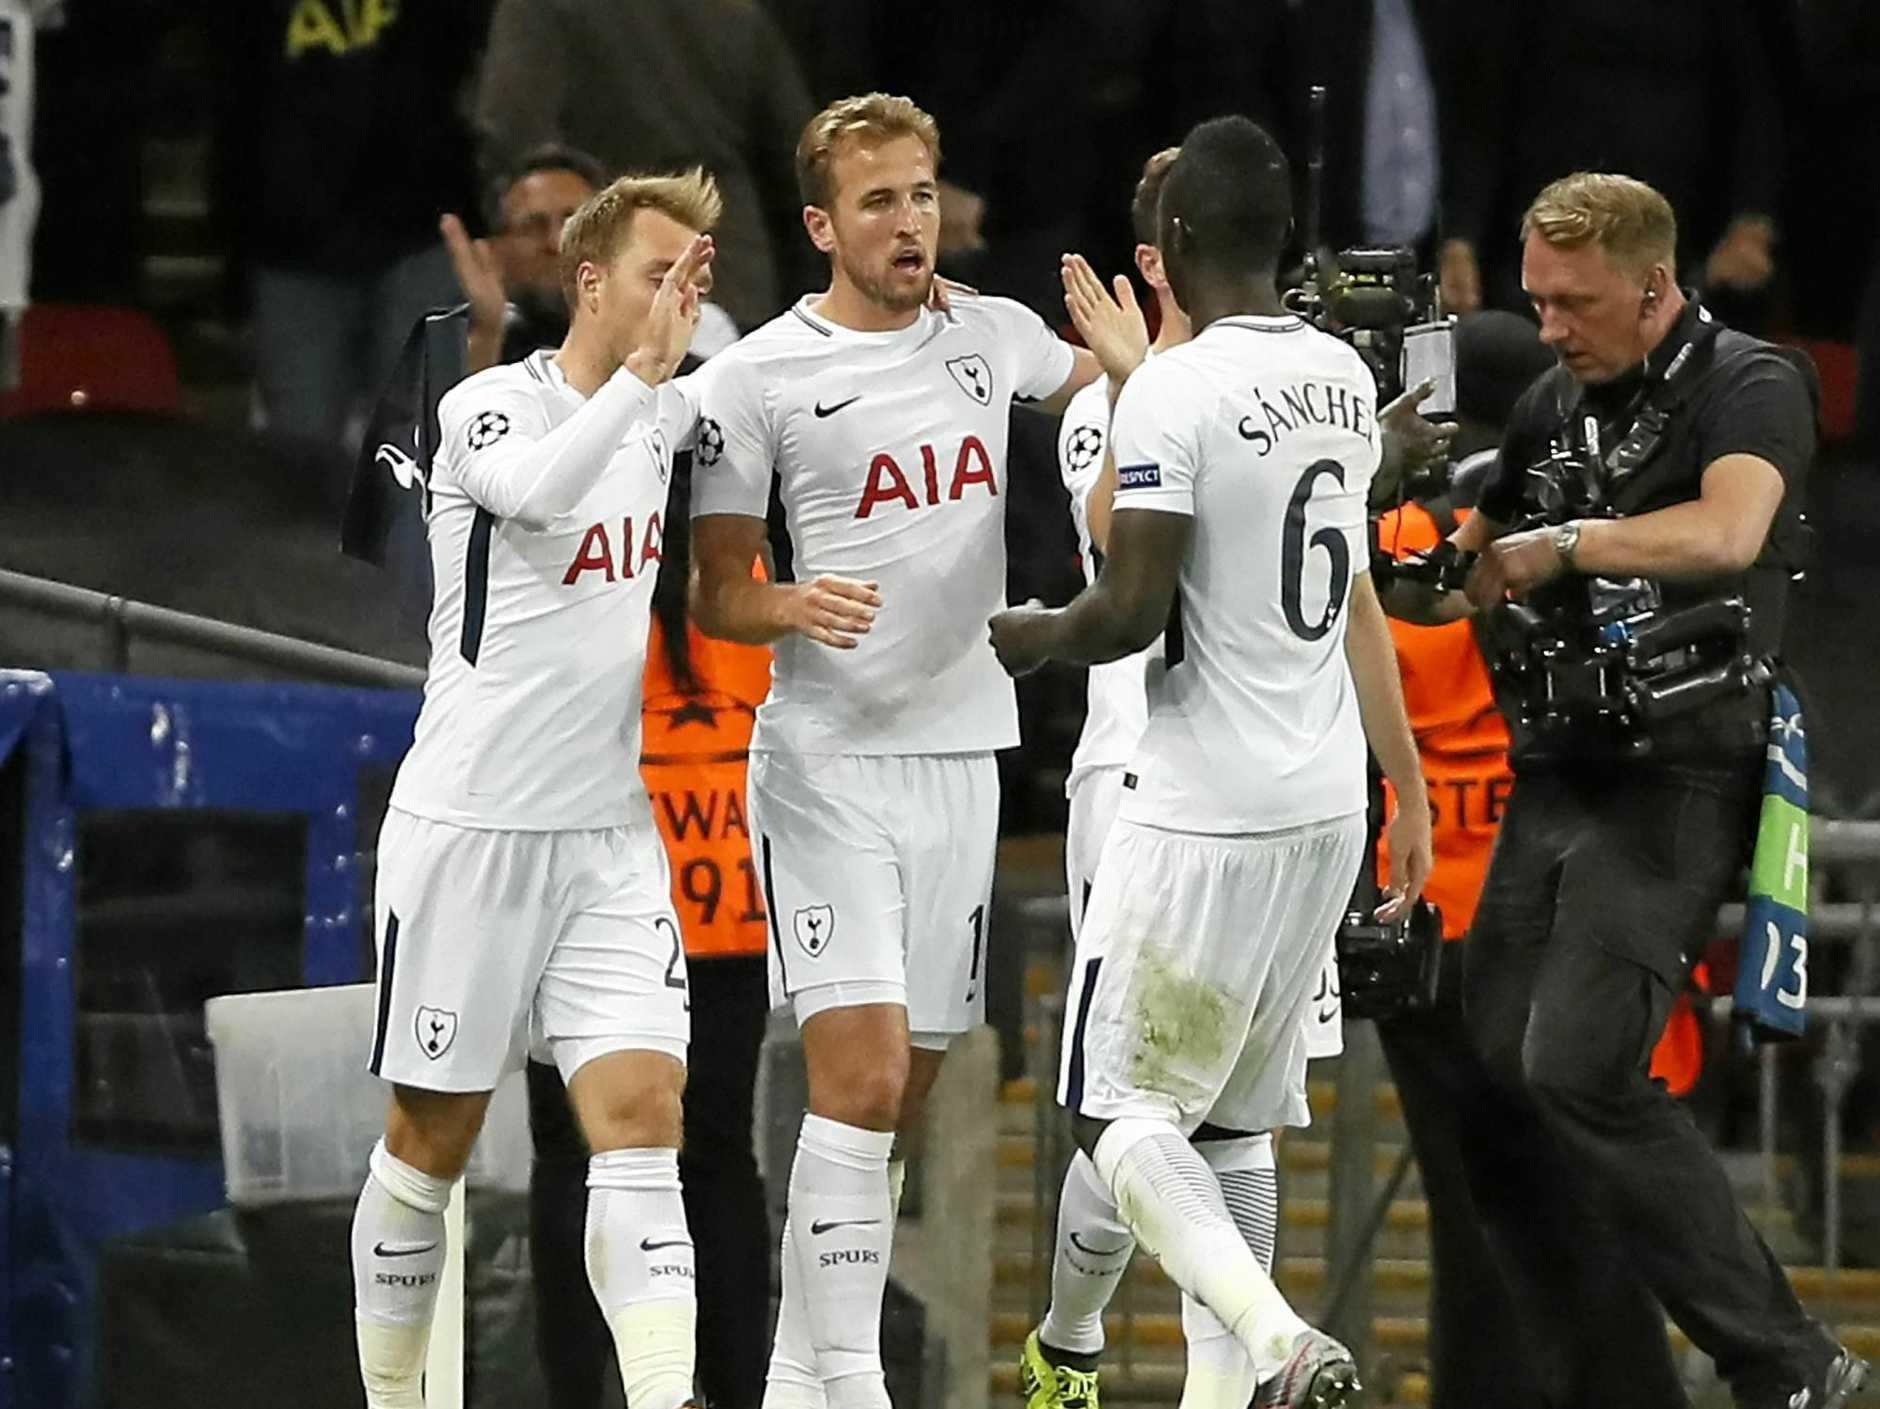 Tottenham's Harry Kane (centre) celebrates after scoring his side's third goal against Borussia Dortmund.